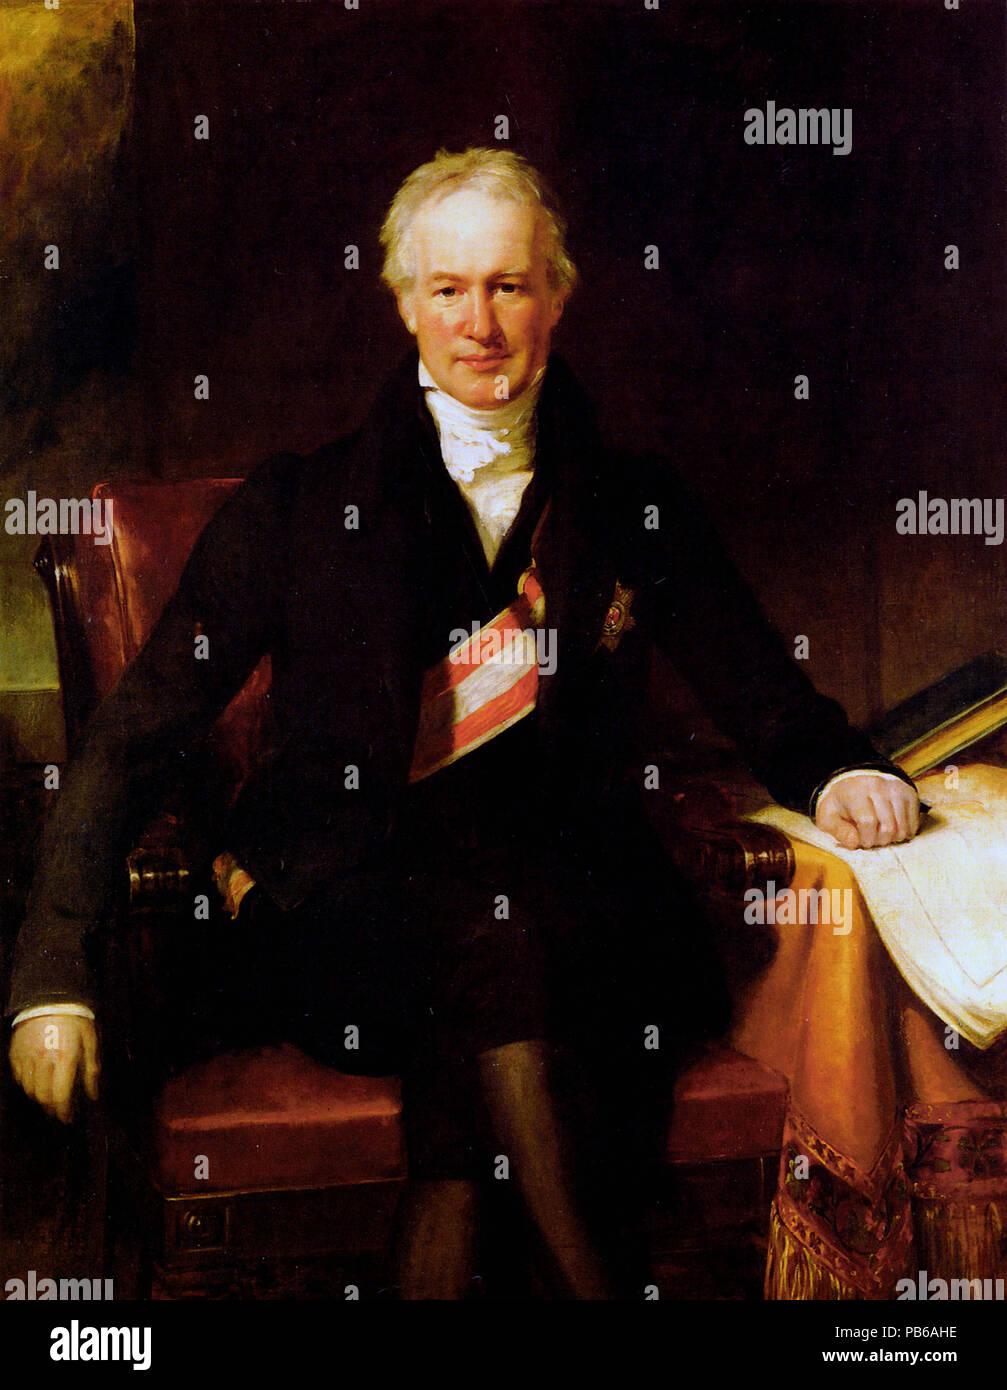 Alexander von Humboldt - Stock Image